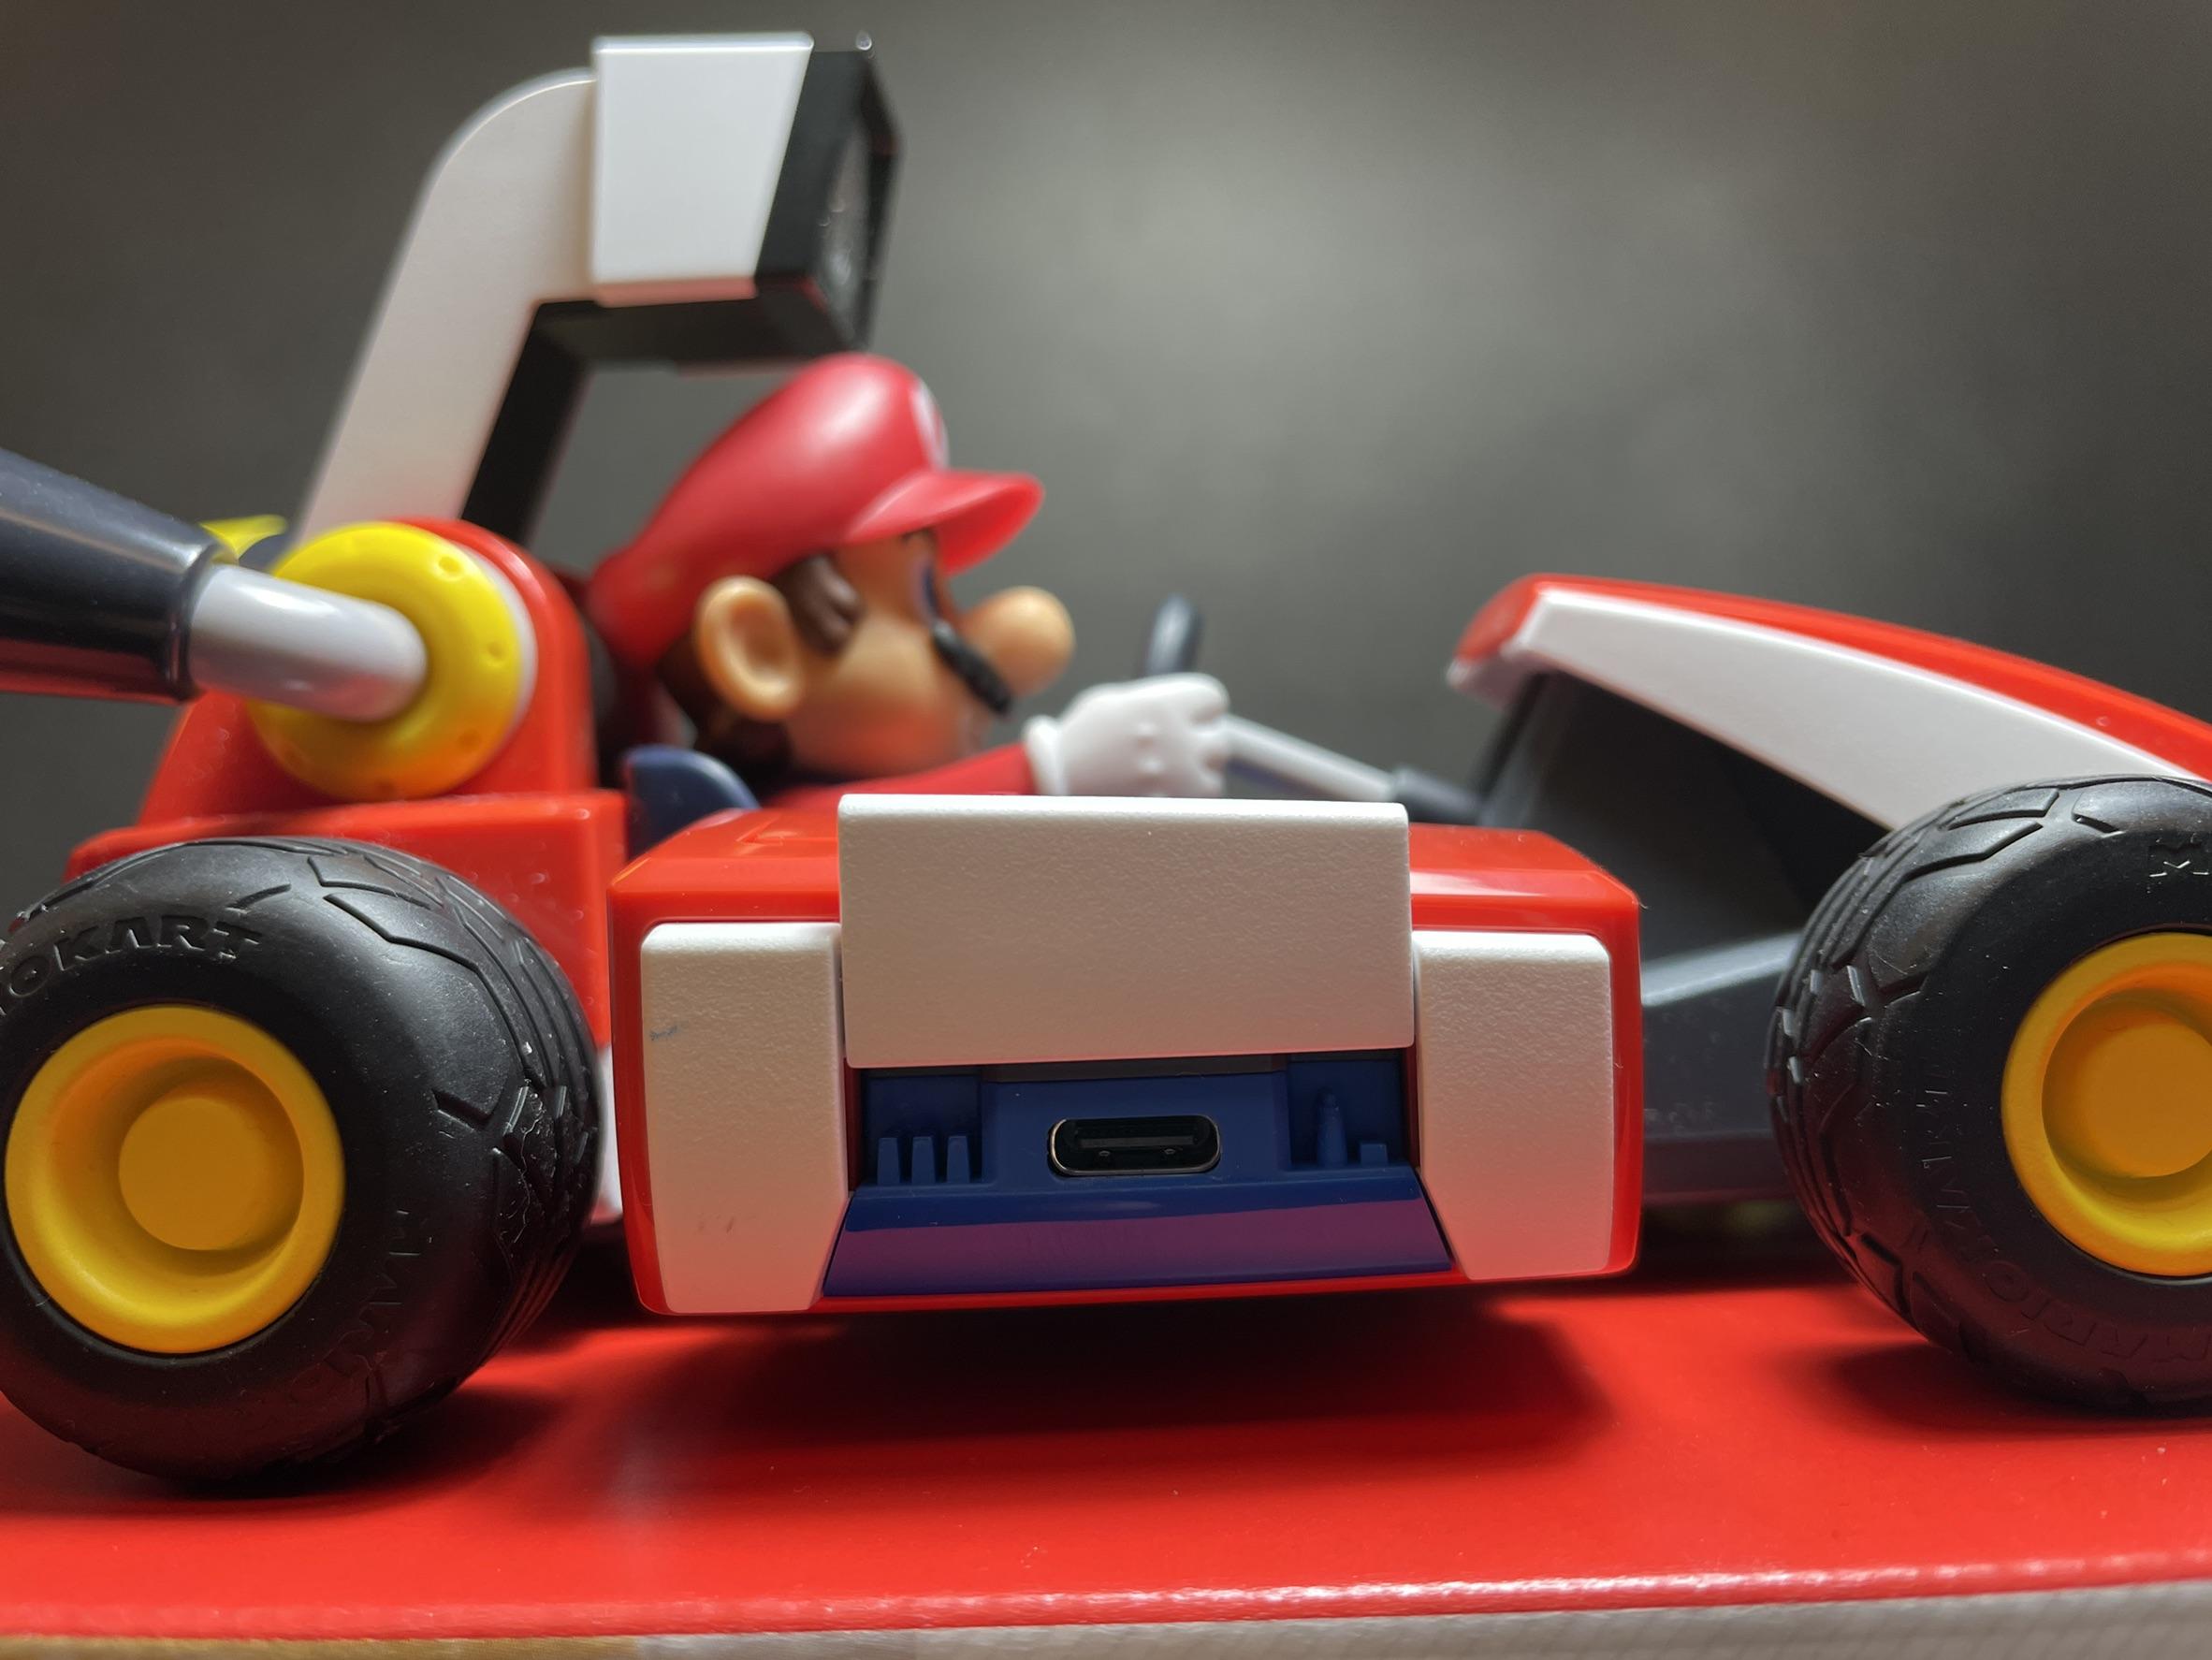 Switch <馬利歐賽車實況:家庭賽車場> 遊戲開箱! - 電腦DIY